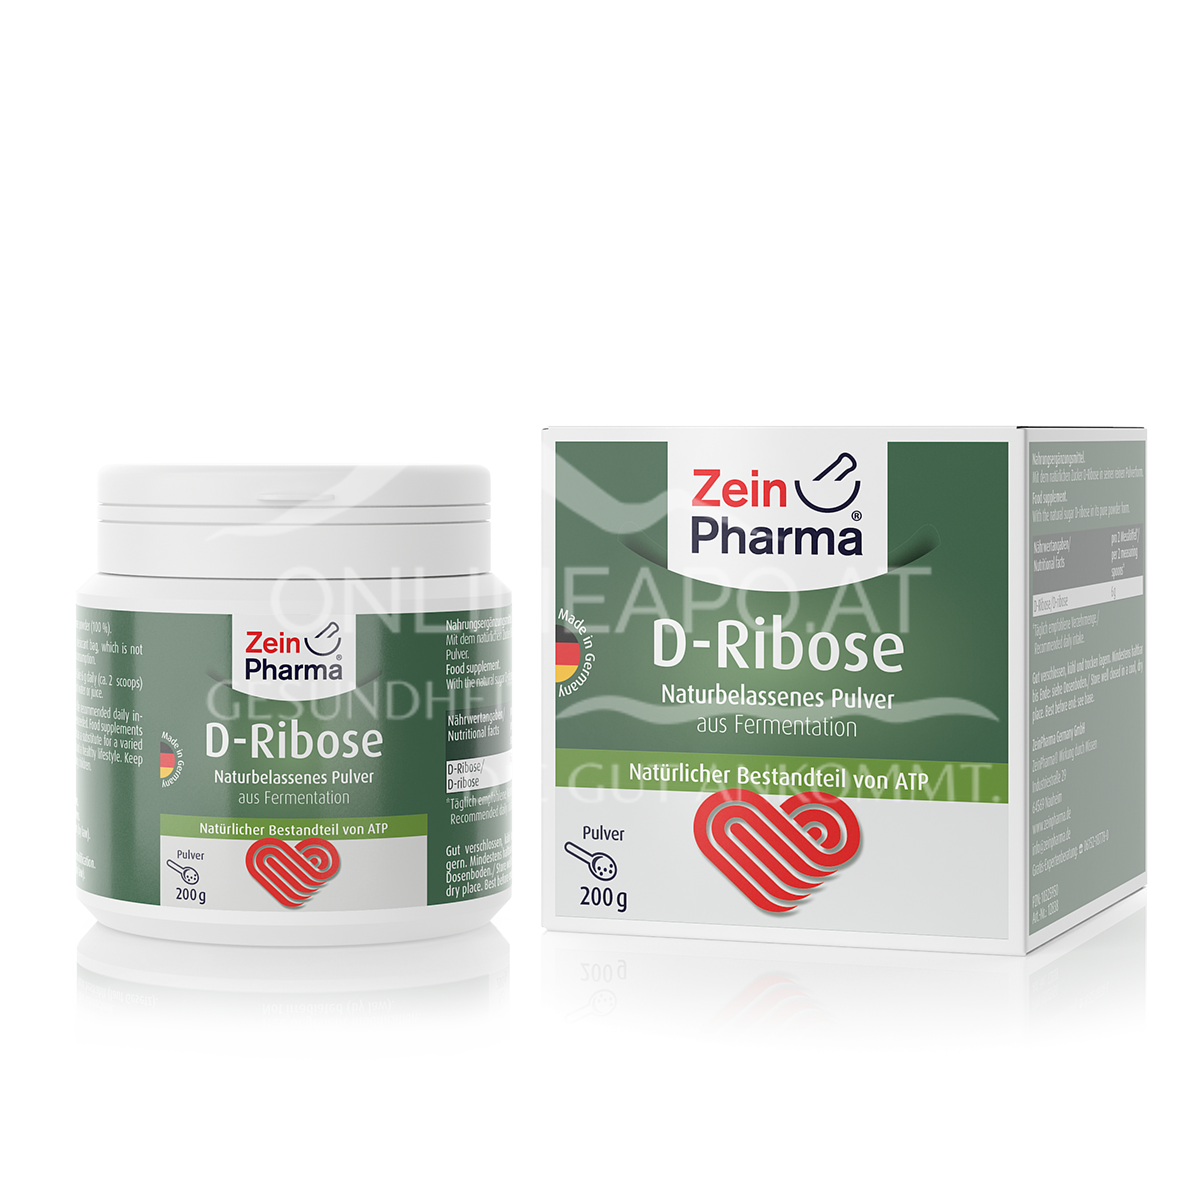 Zeinpharma D-Ribose Pulver